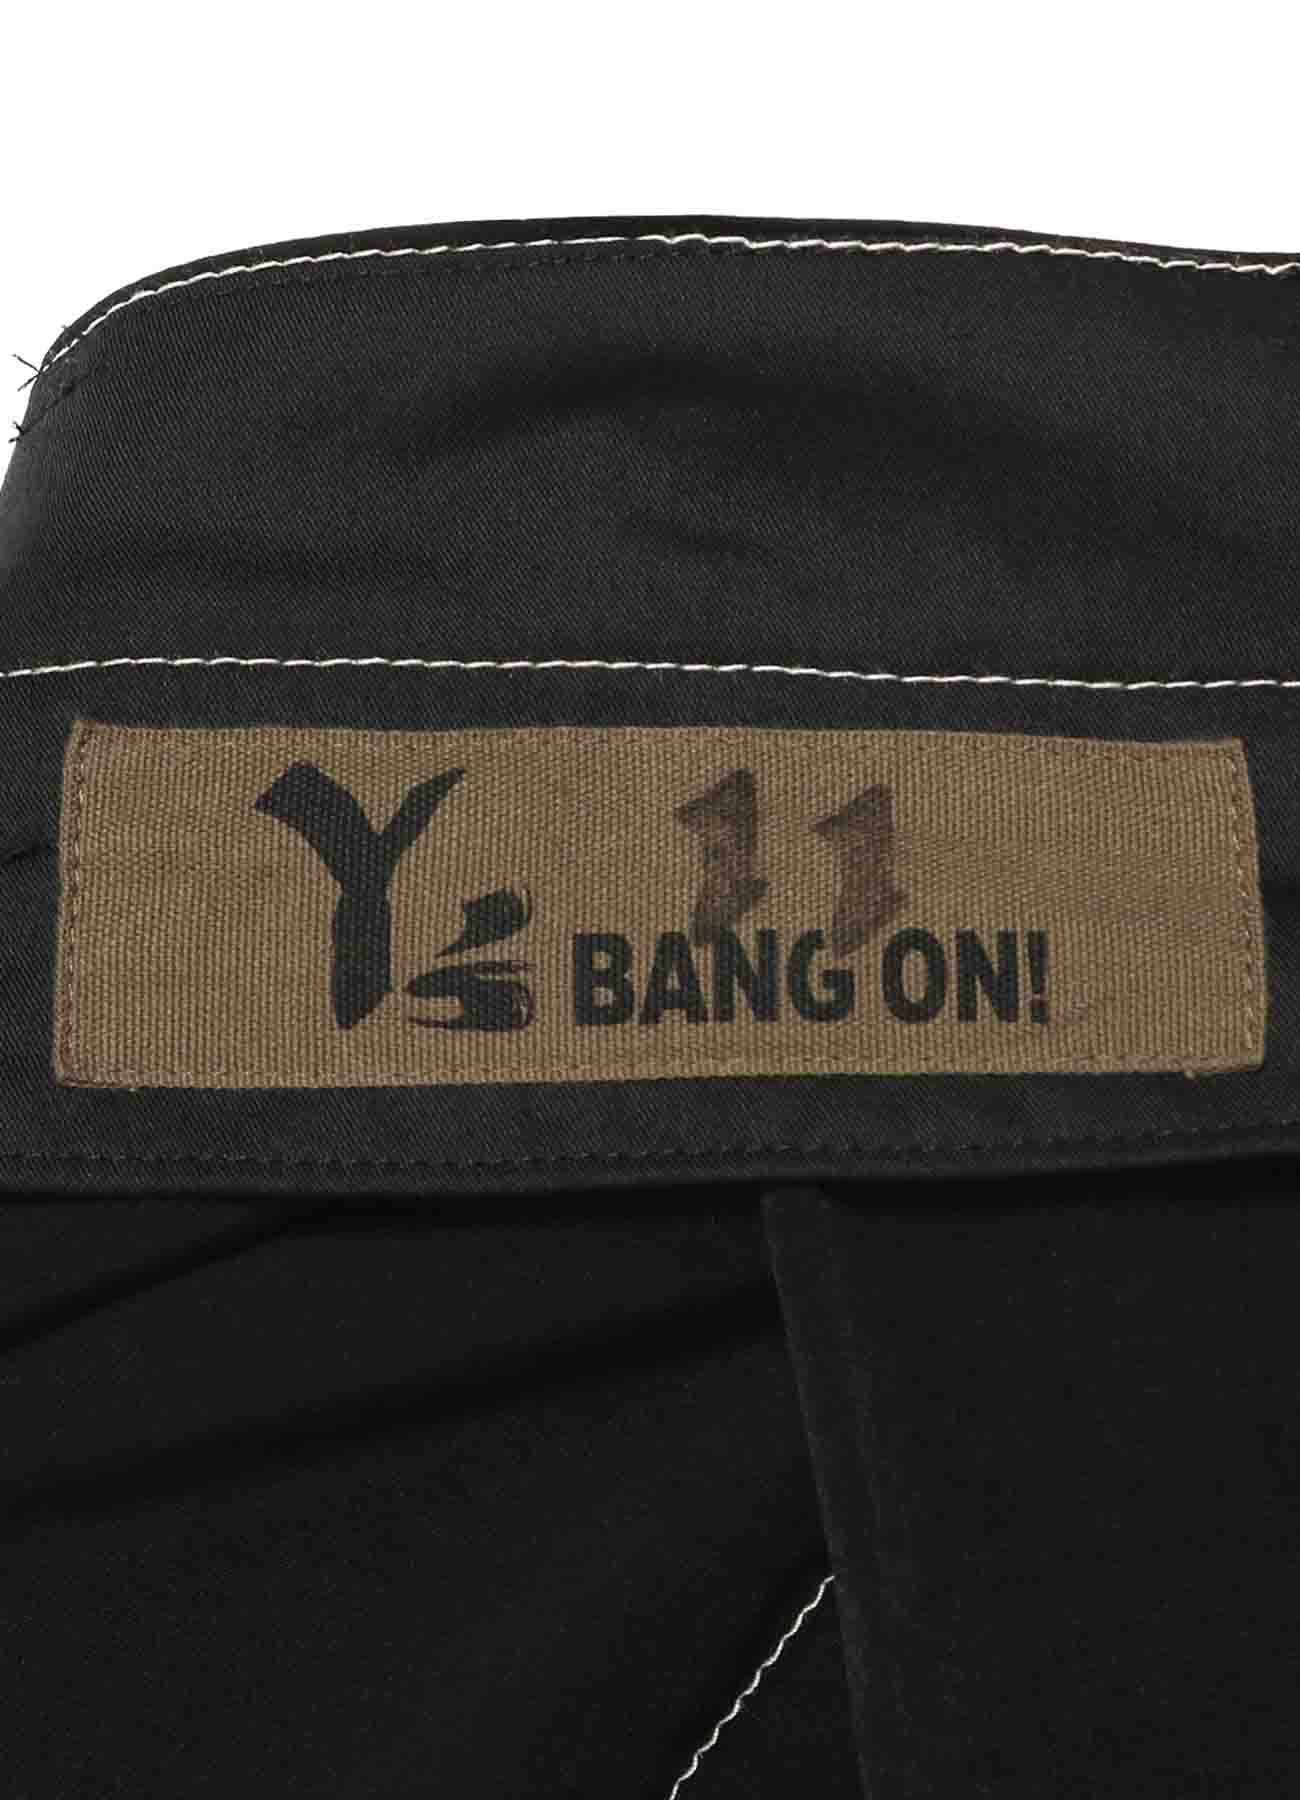 Y's BANG ON!No.11 Pleats pants Ta/Pe-dechine